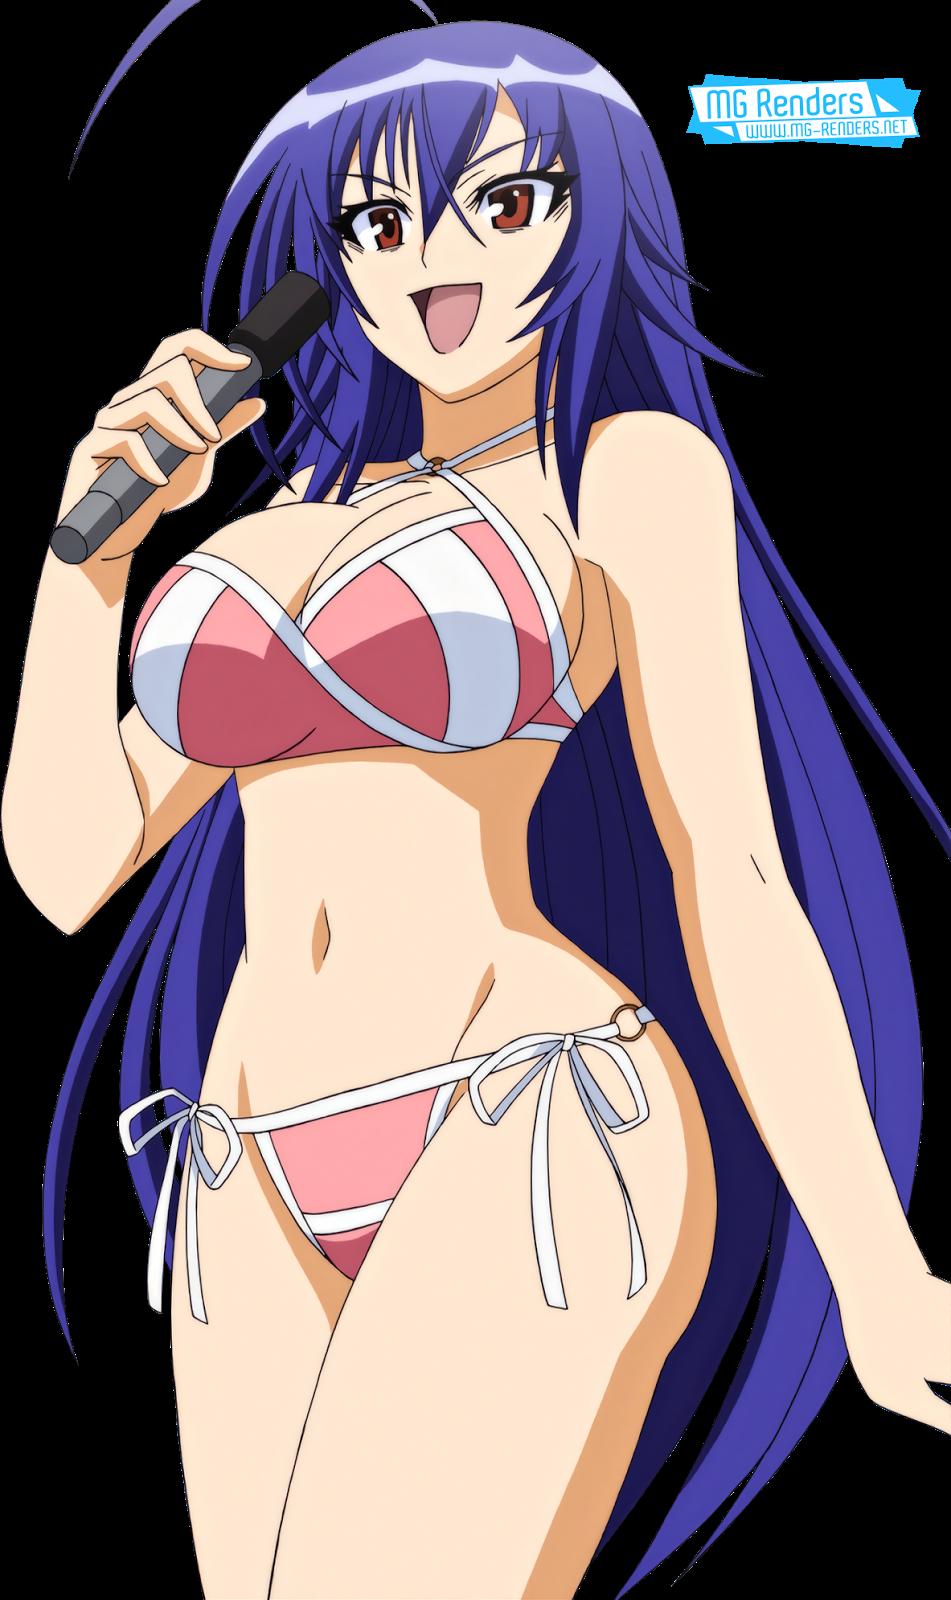 Tags: Anime, Render,  Kurokami Medaka,  Medaka Box,  PNG, Image, Picture